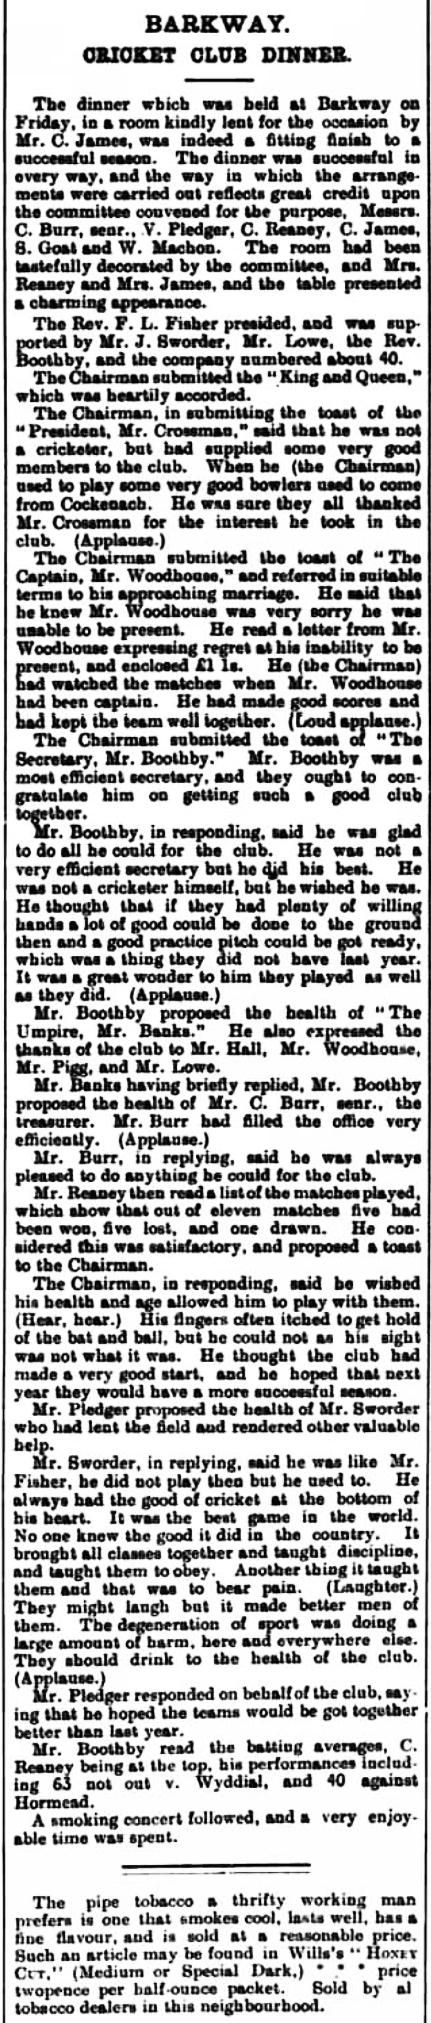 Barkway_Cricket_Club_Dinner_1908